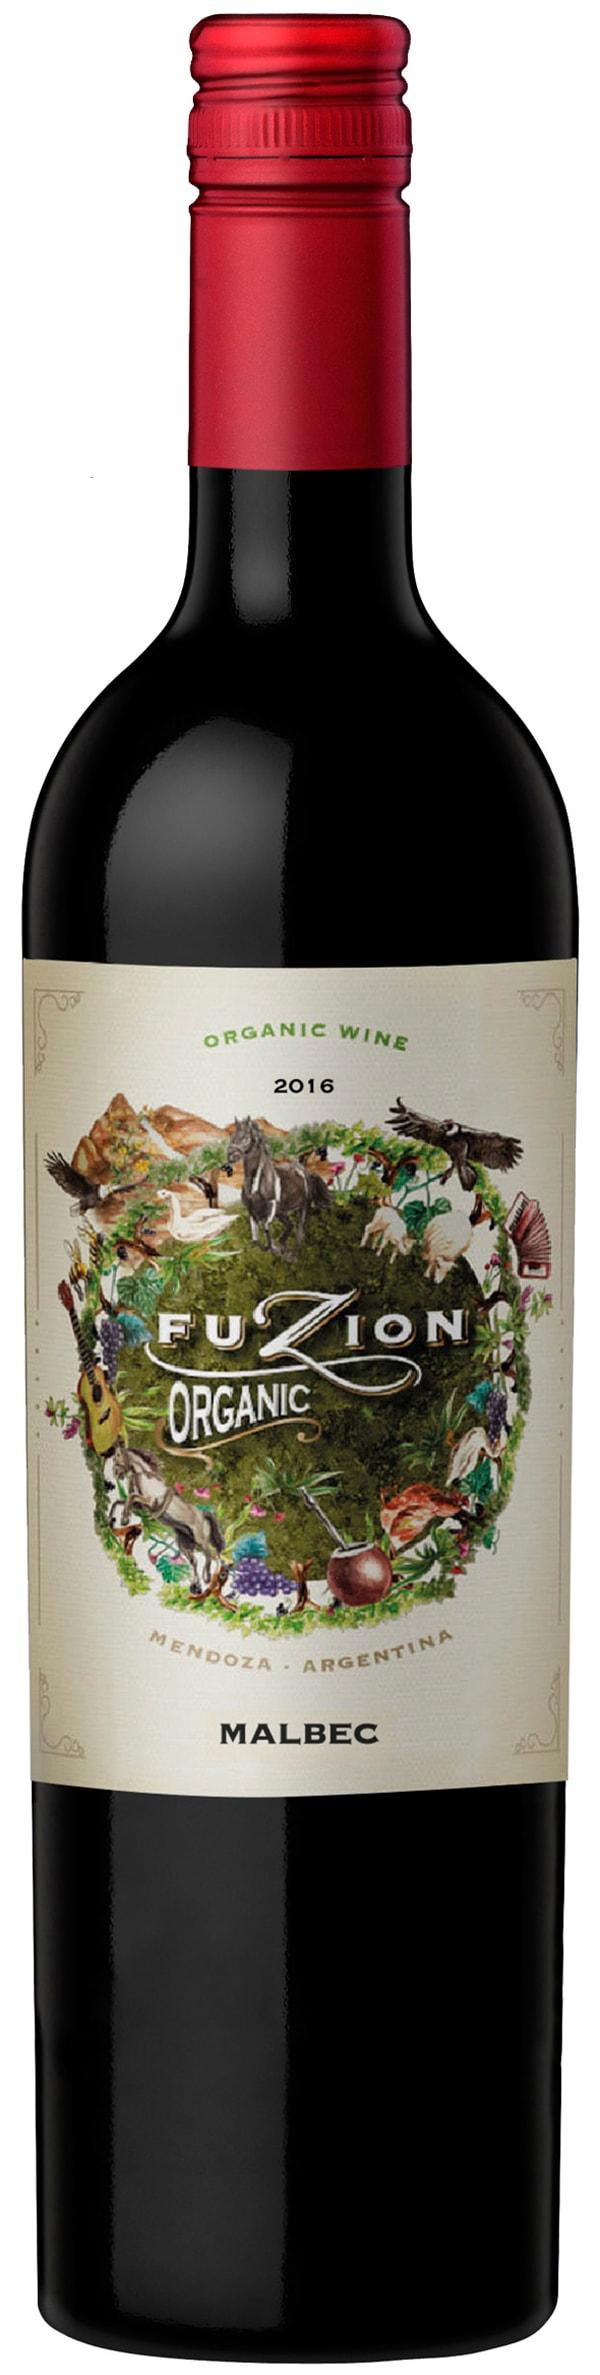 Fuzion Organic Malbec 2017